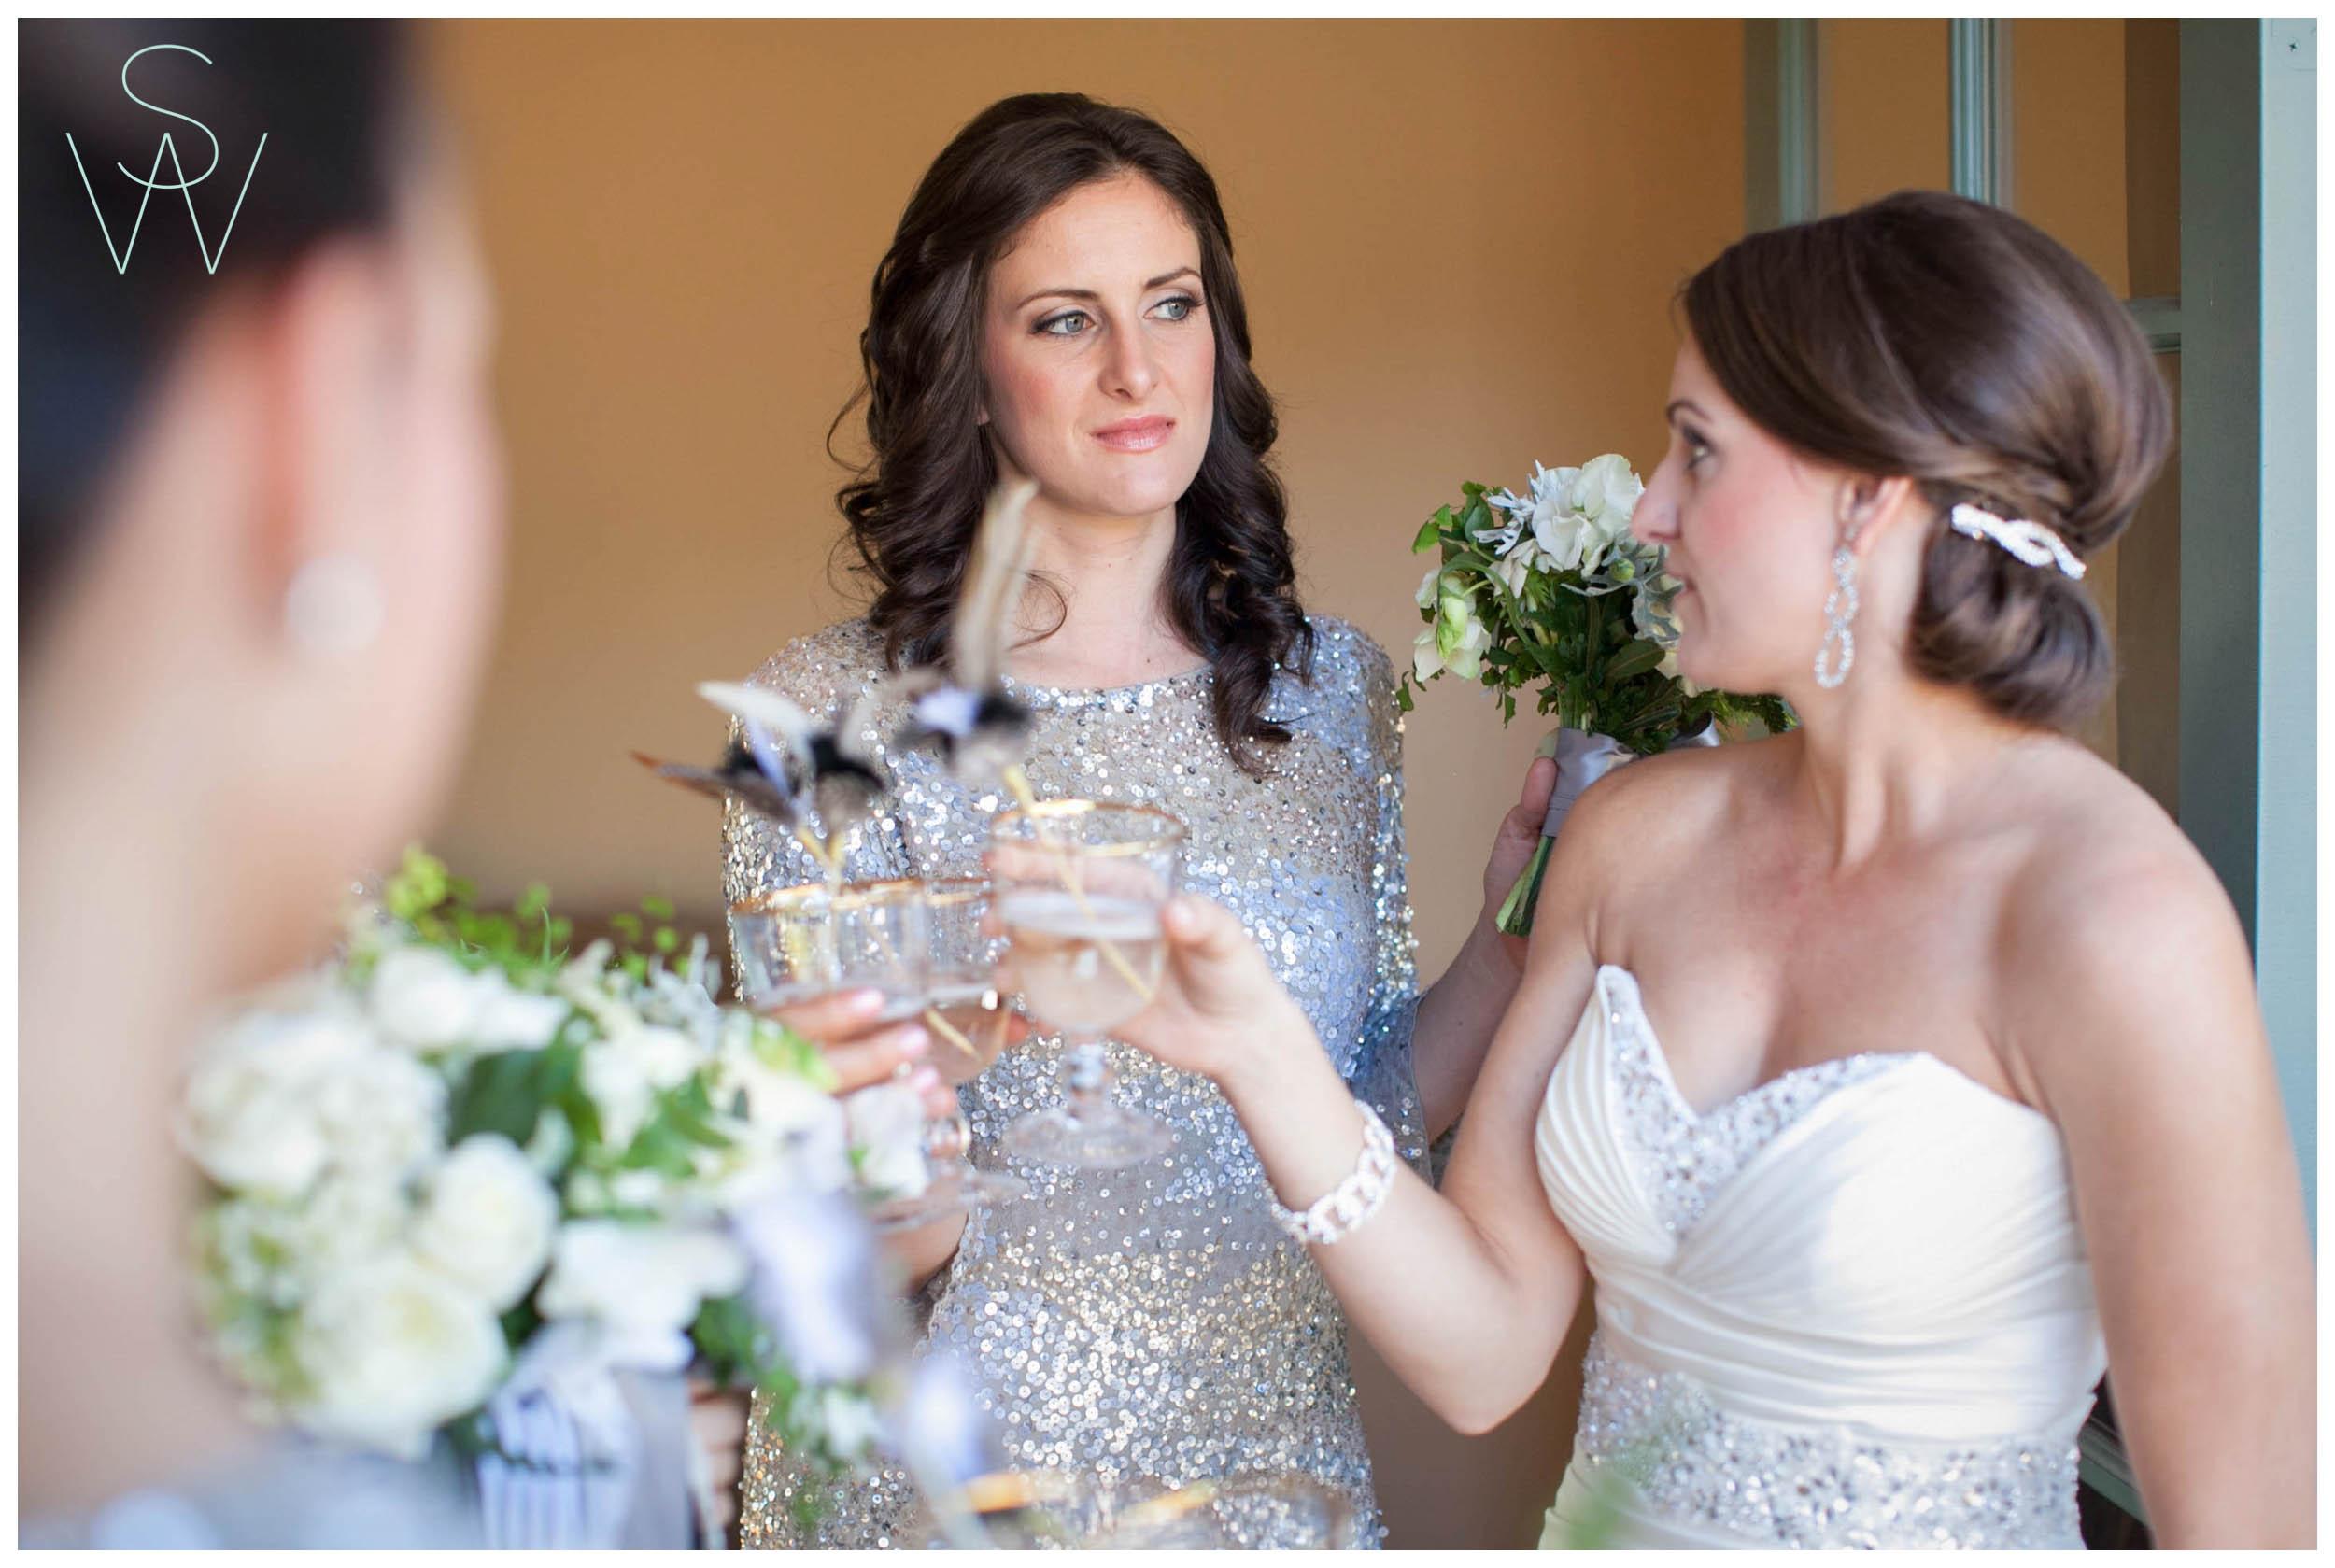 Shewanders.sdma_.wedding.photography-1008.jpg.wedding.photography-1008.jpg